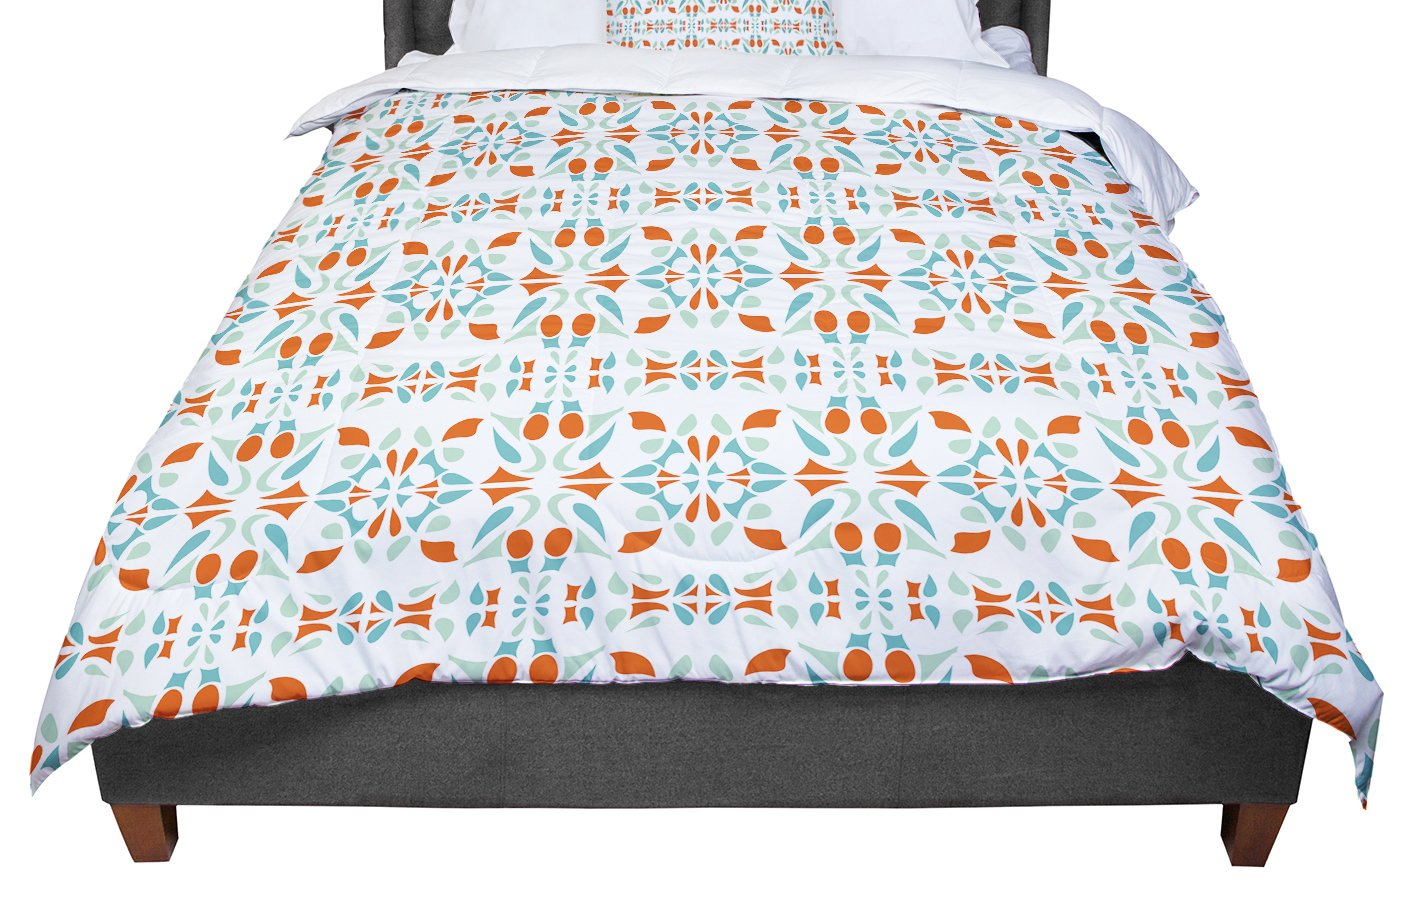 88 X 88 KESS InHouse Miranda Mol Italian Kitchen Orange Green Queen Comforter